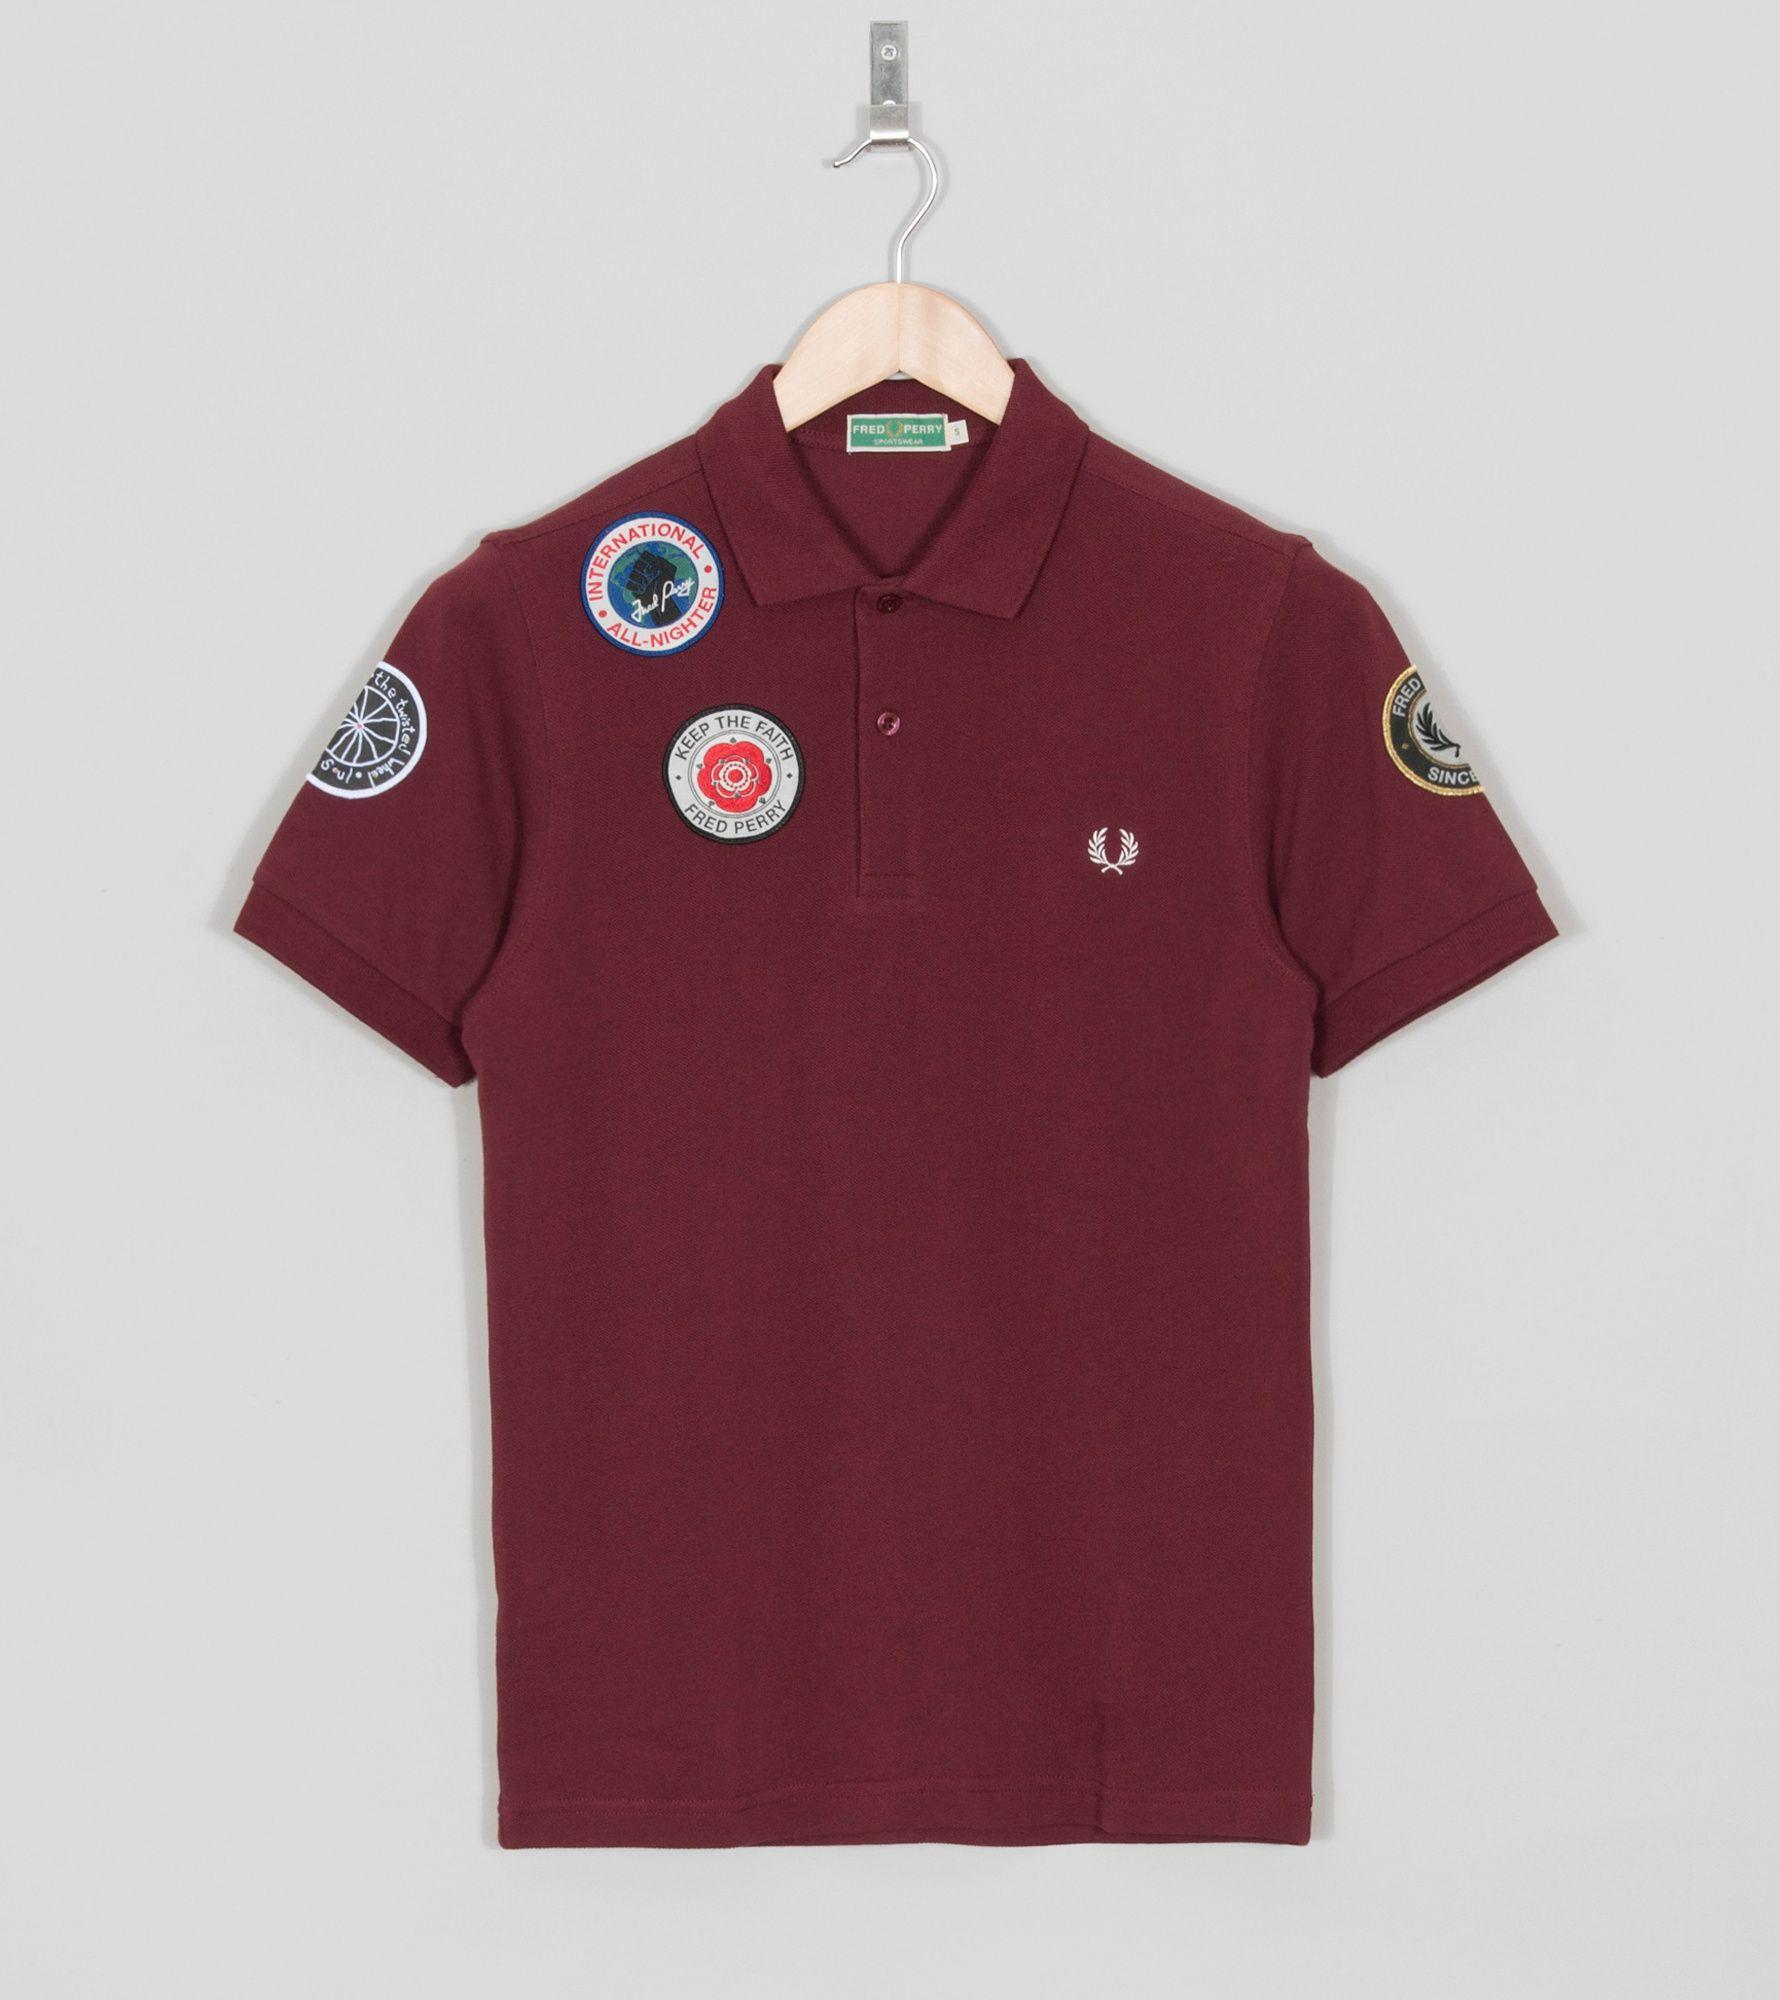 ca696c16 Northern Soul Polo T Shirts - DREAMWORKS